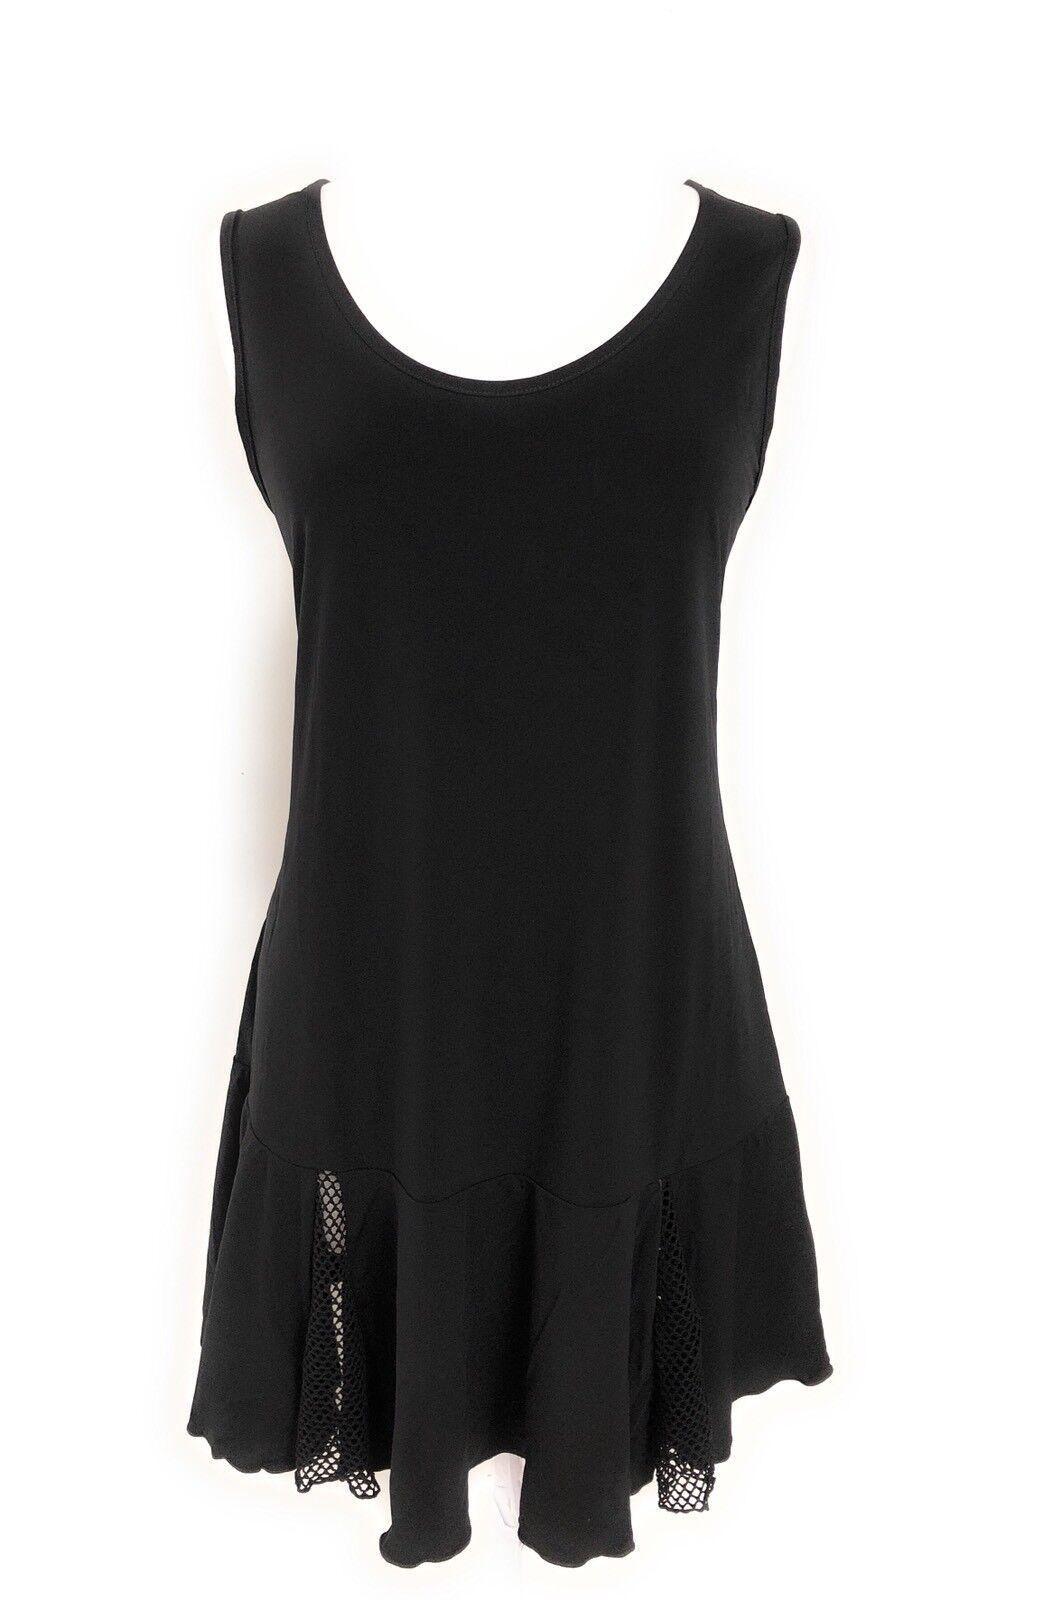 Jordan Taylor Damen Schwarz Netz Rand Strandbedeckung Bademode Tunika Kleid Nwt